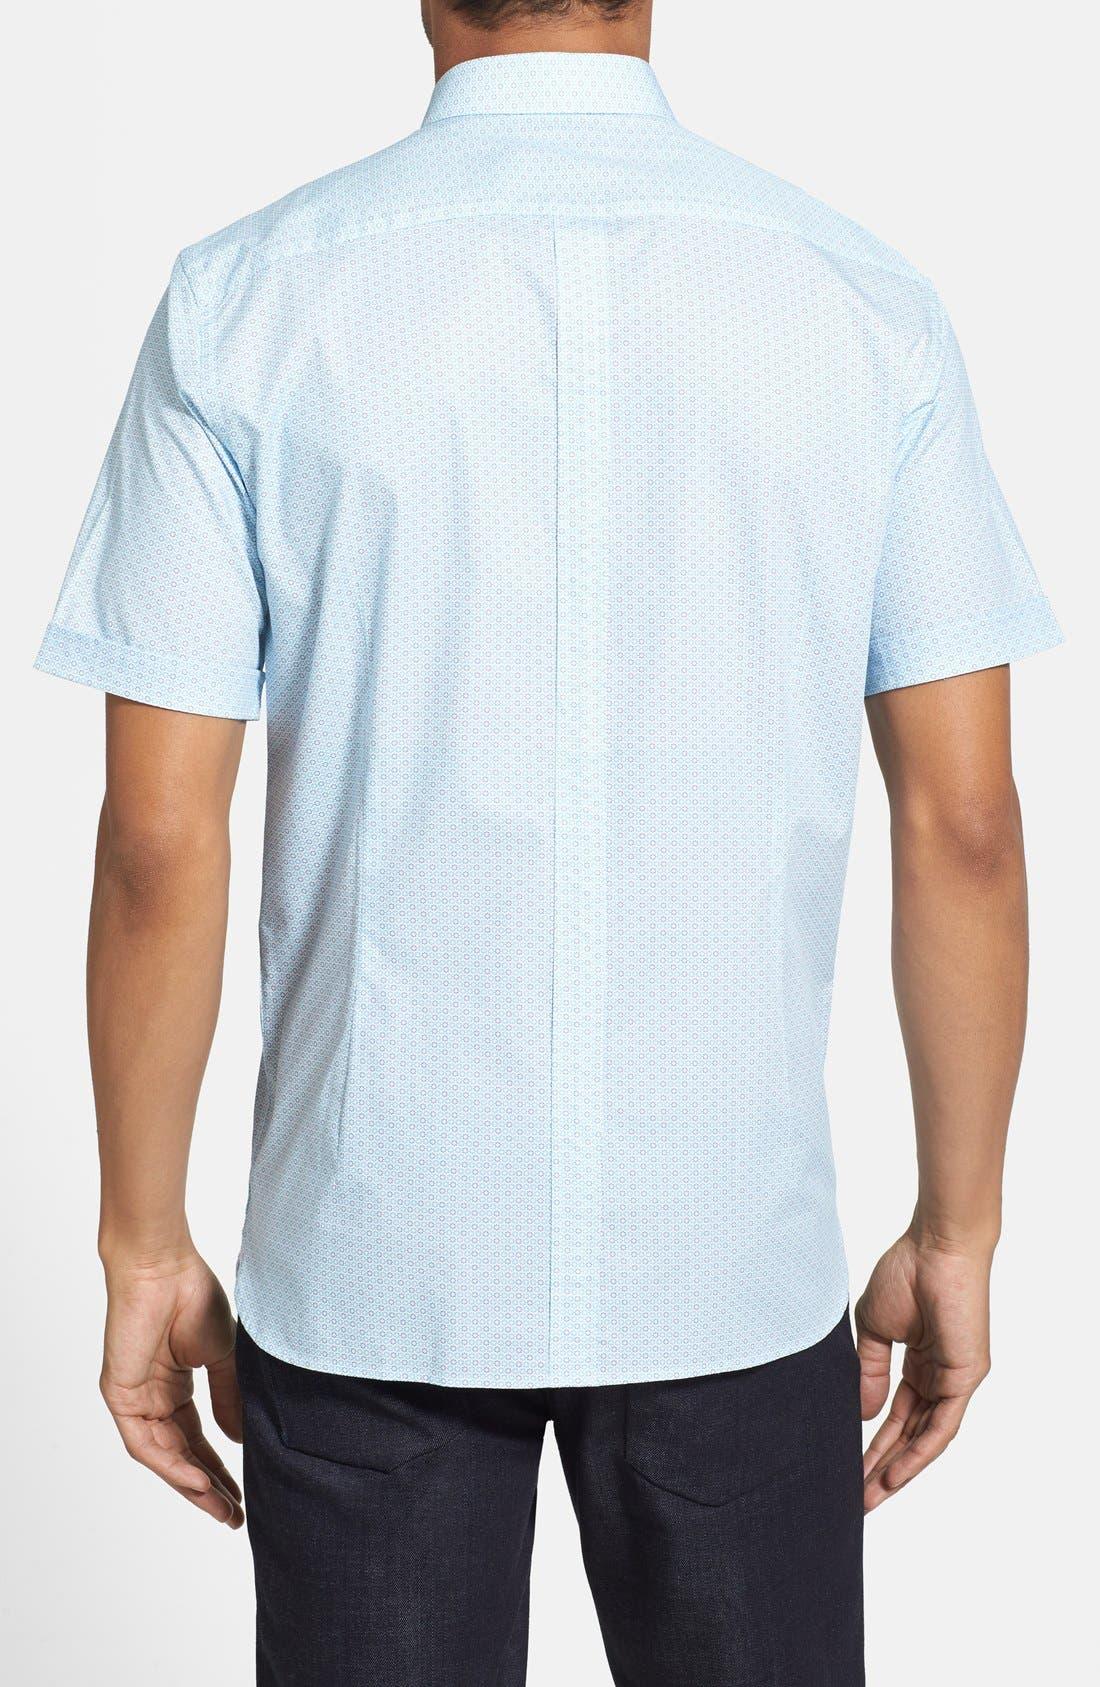 Alternate Image 2  - Report Collection Trim Fit Short Sleeve Sport Shirt